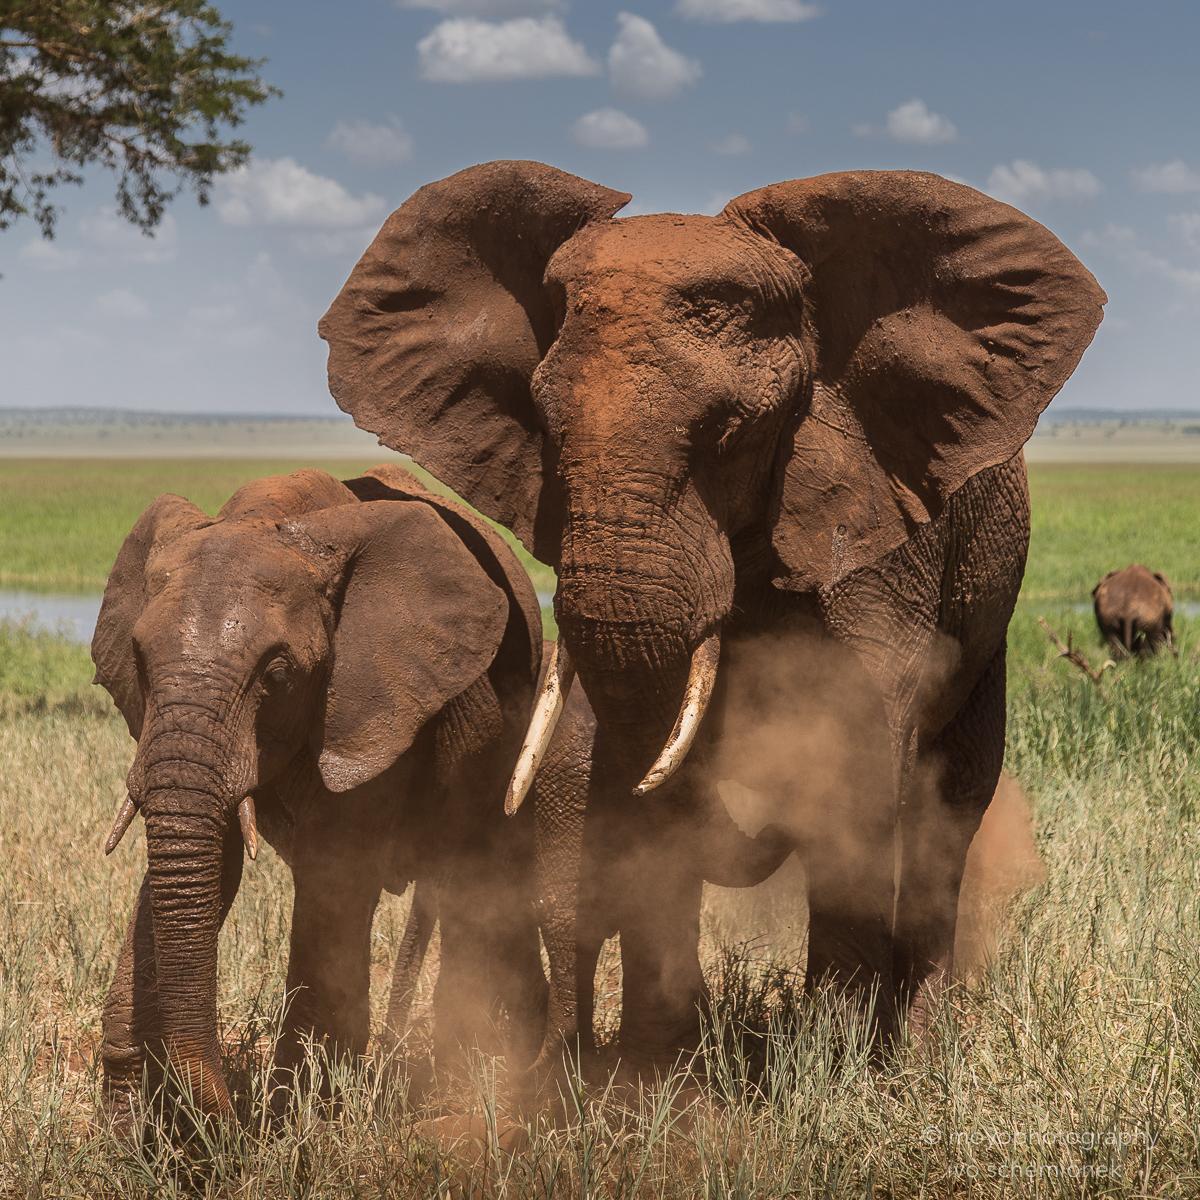 elephant's dusting session - 2015